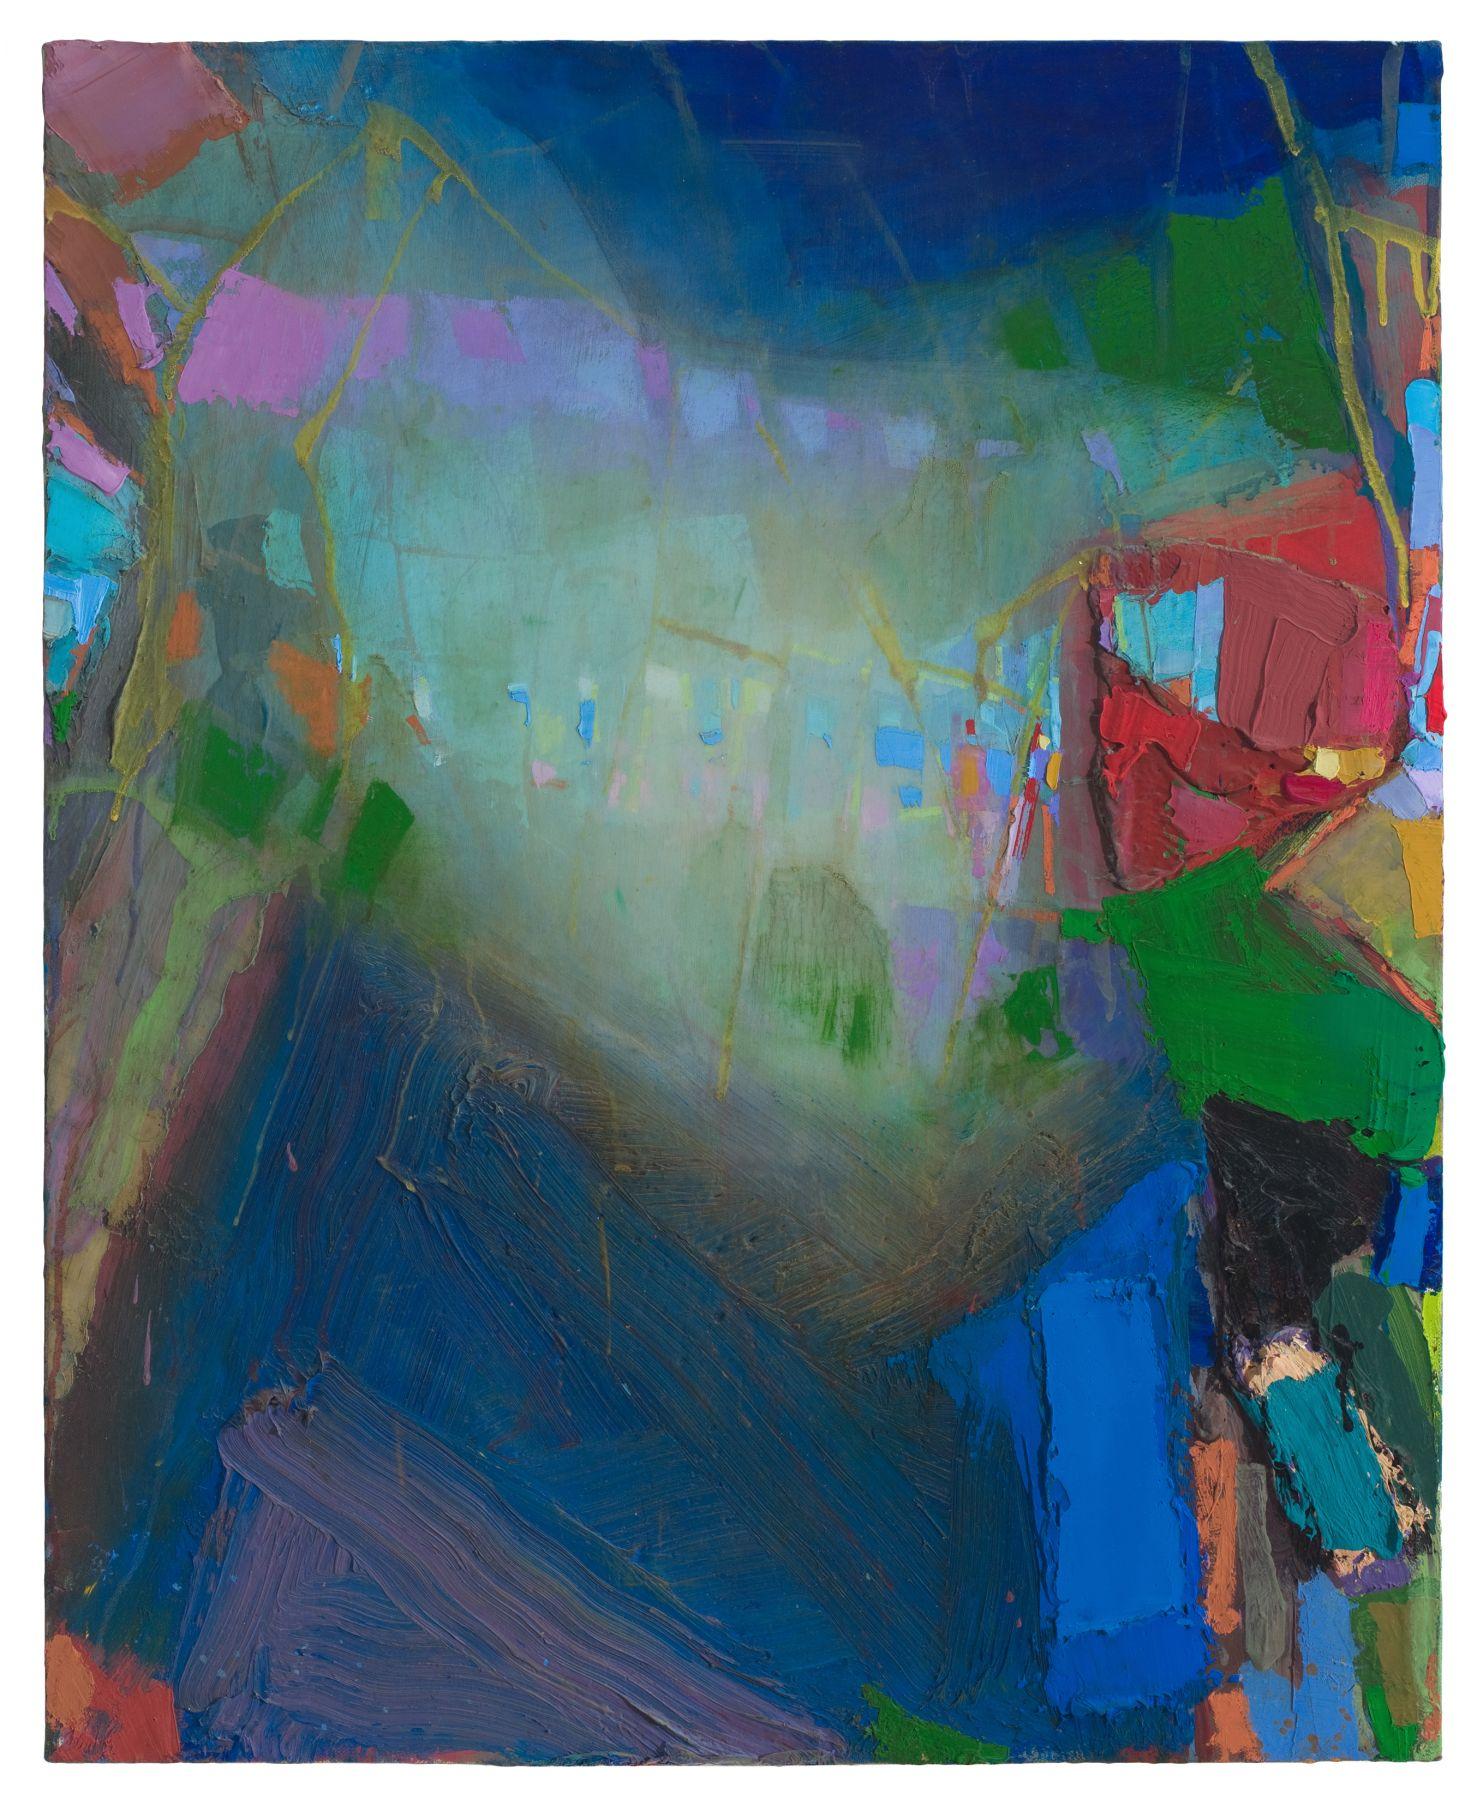 Brian Rutenberg Gainsborough Suite (SOLD), 2010, oil on linen, 32 x 26 inches